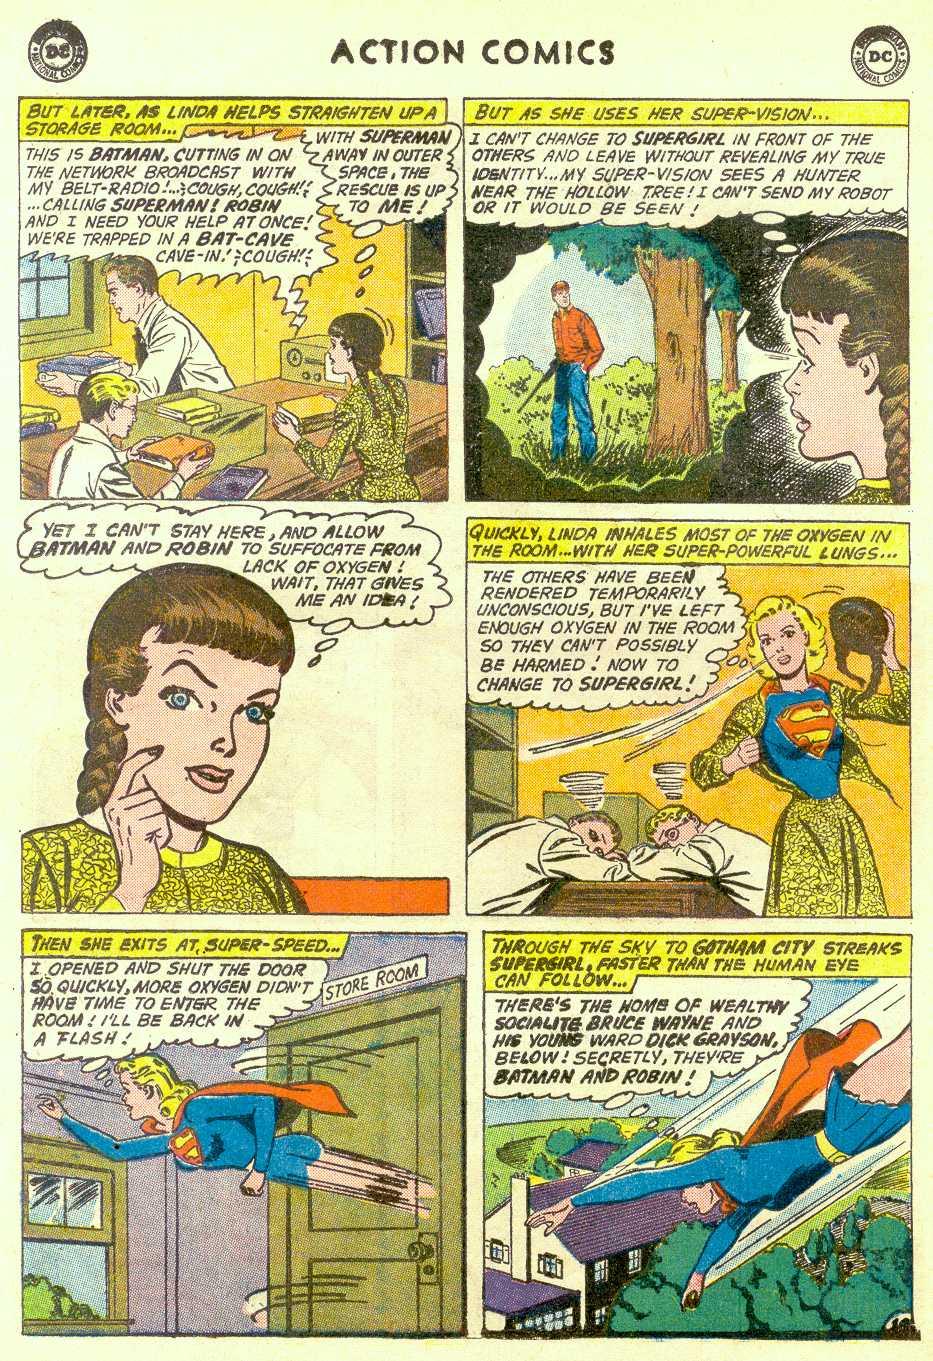 Action Comics (1938) 270 Page 25